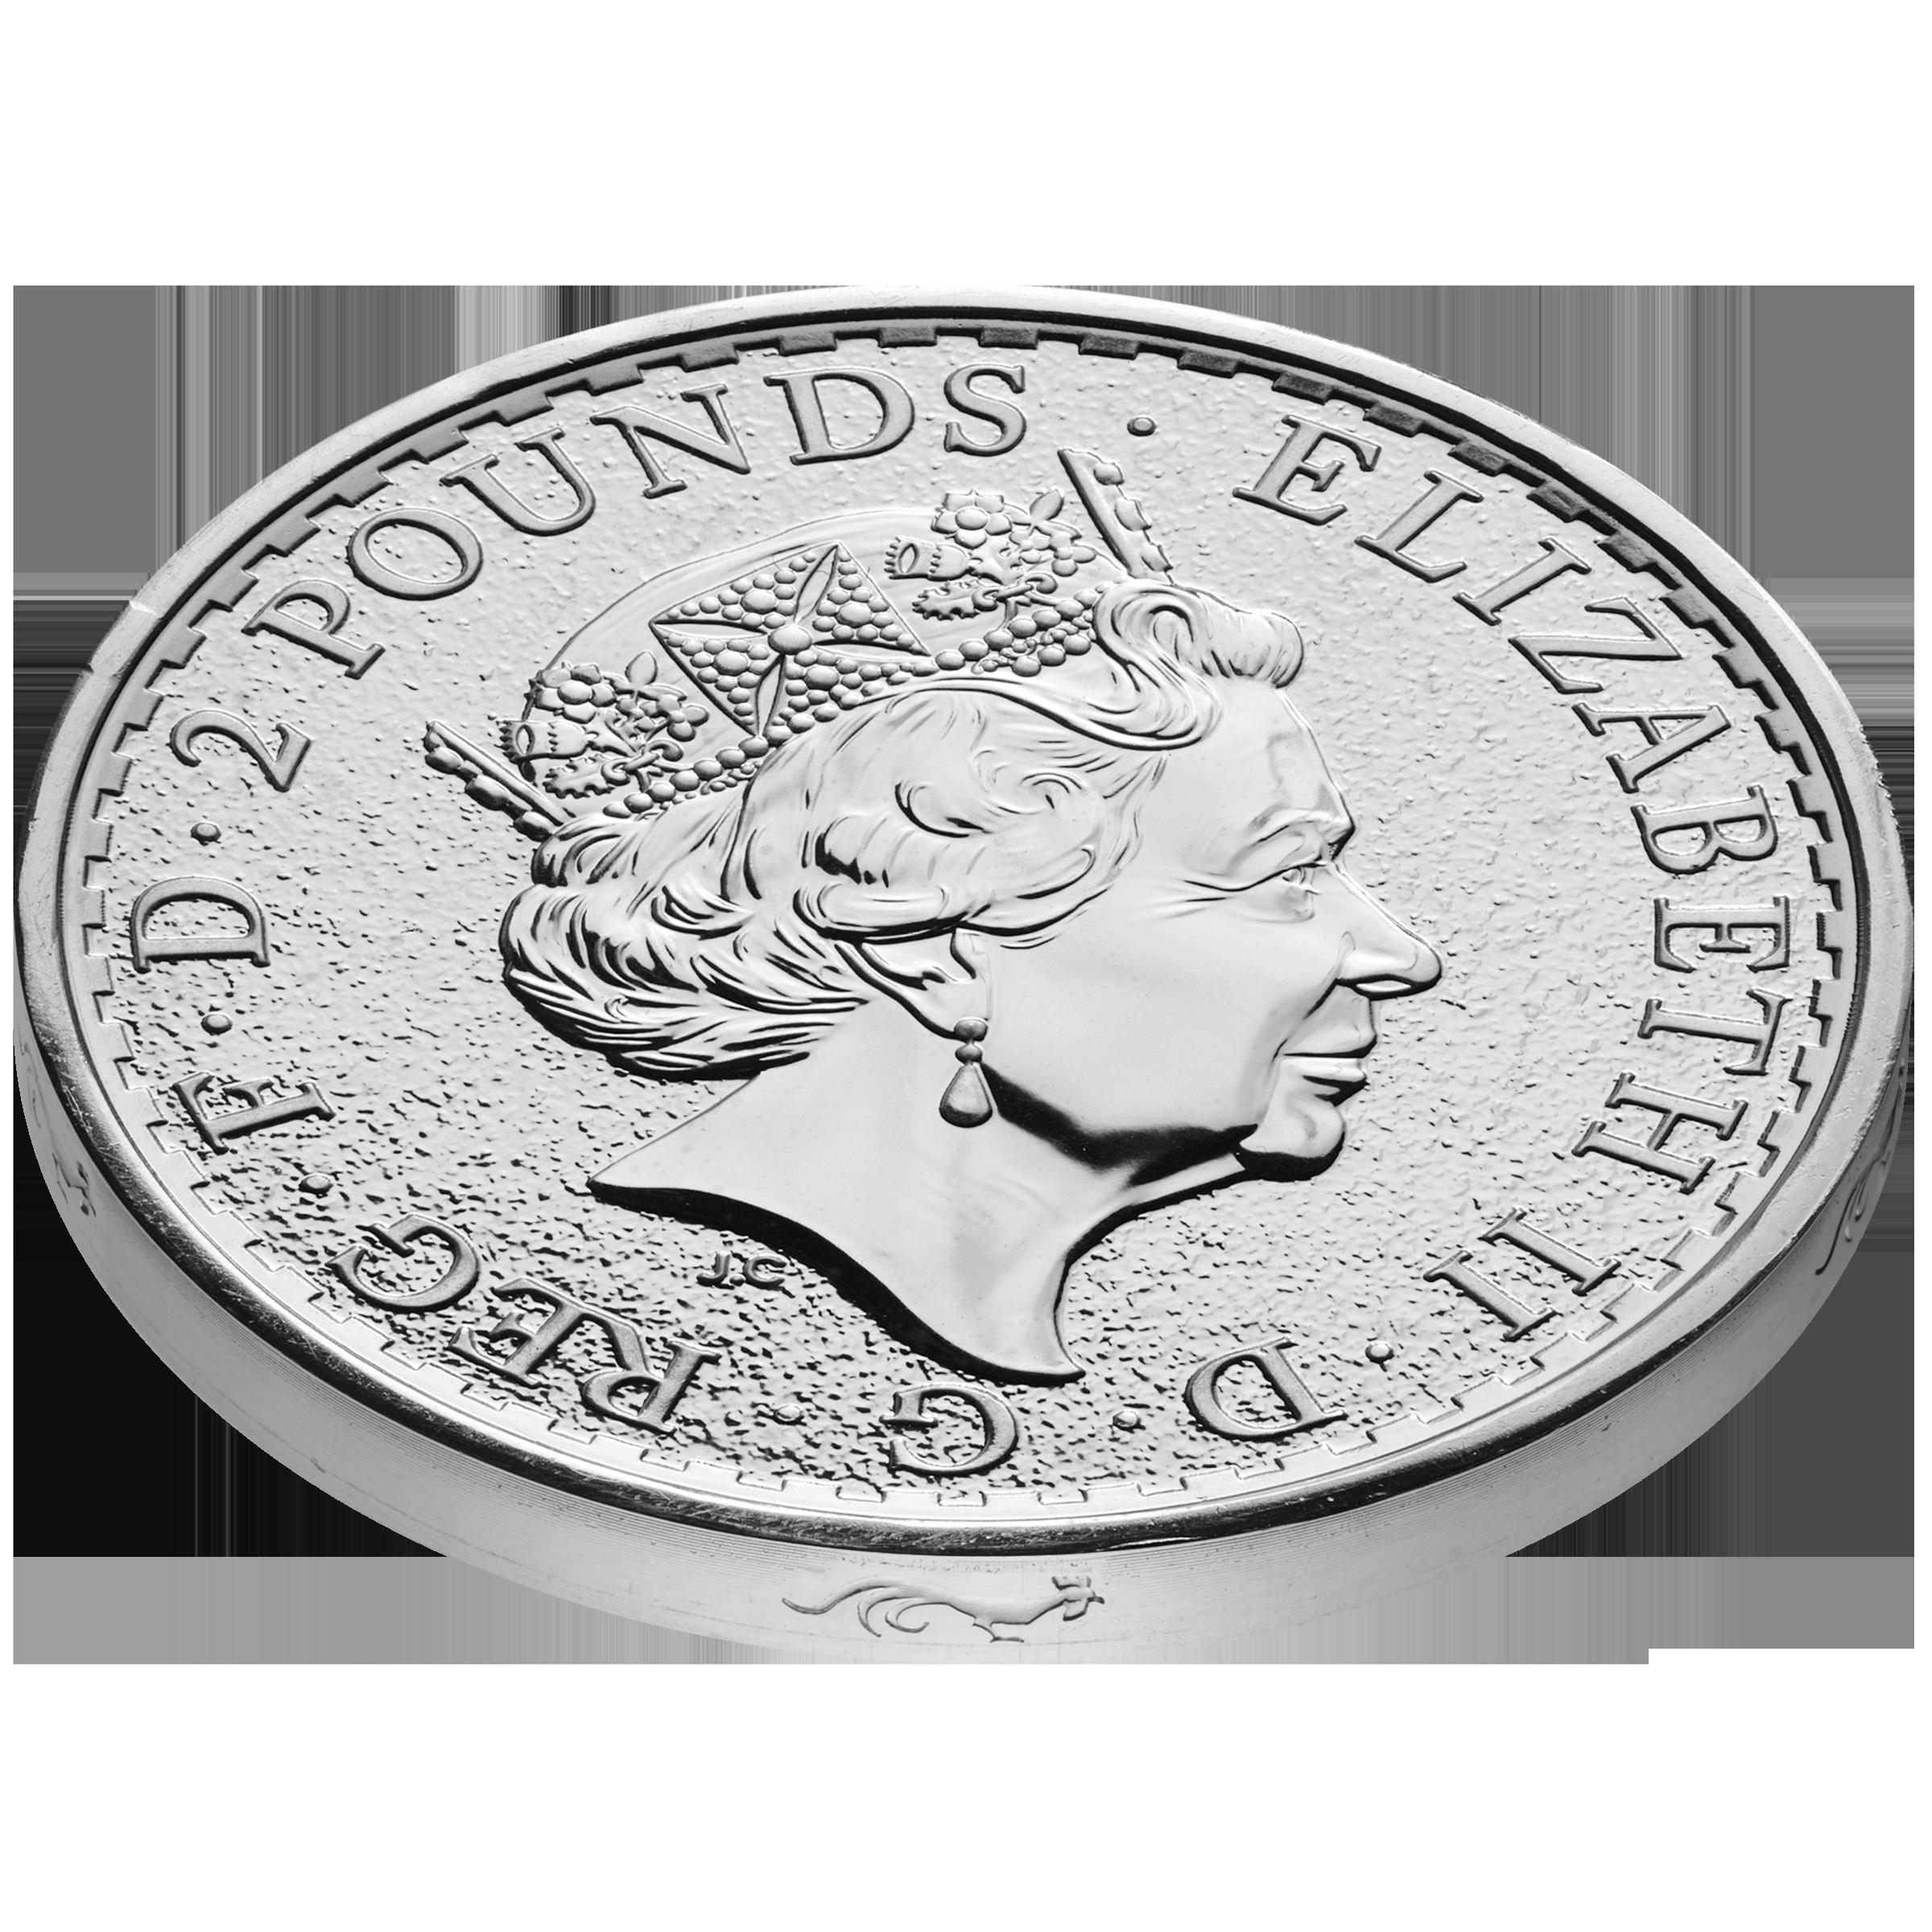 2016 1-oz Silver Britannia with Monkey Privy Mark